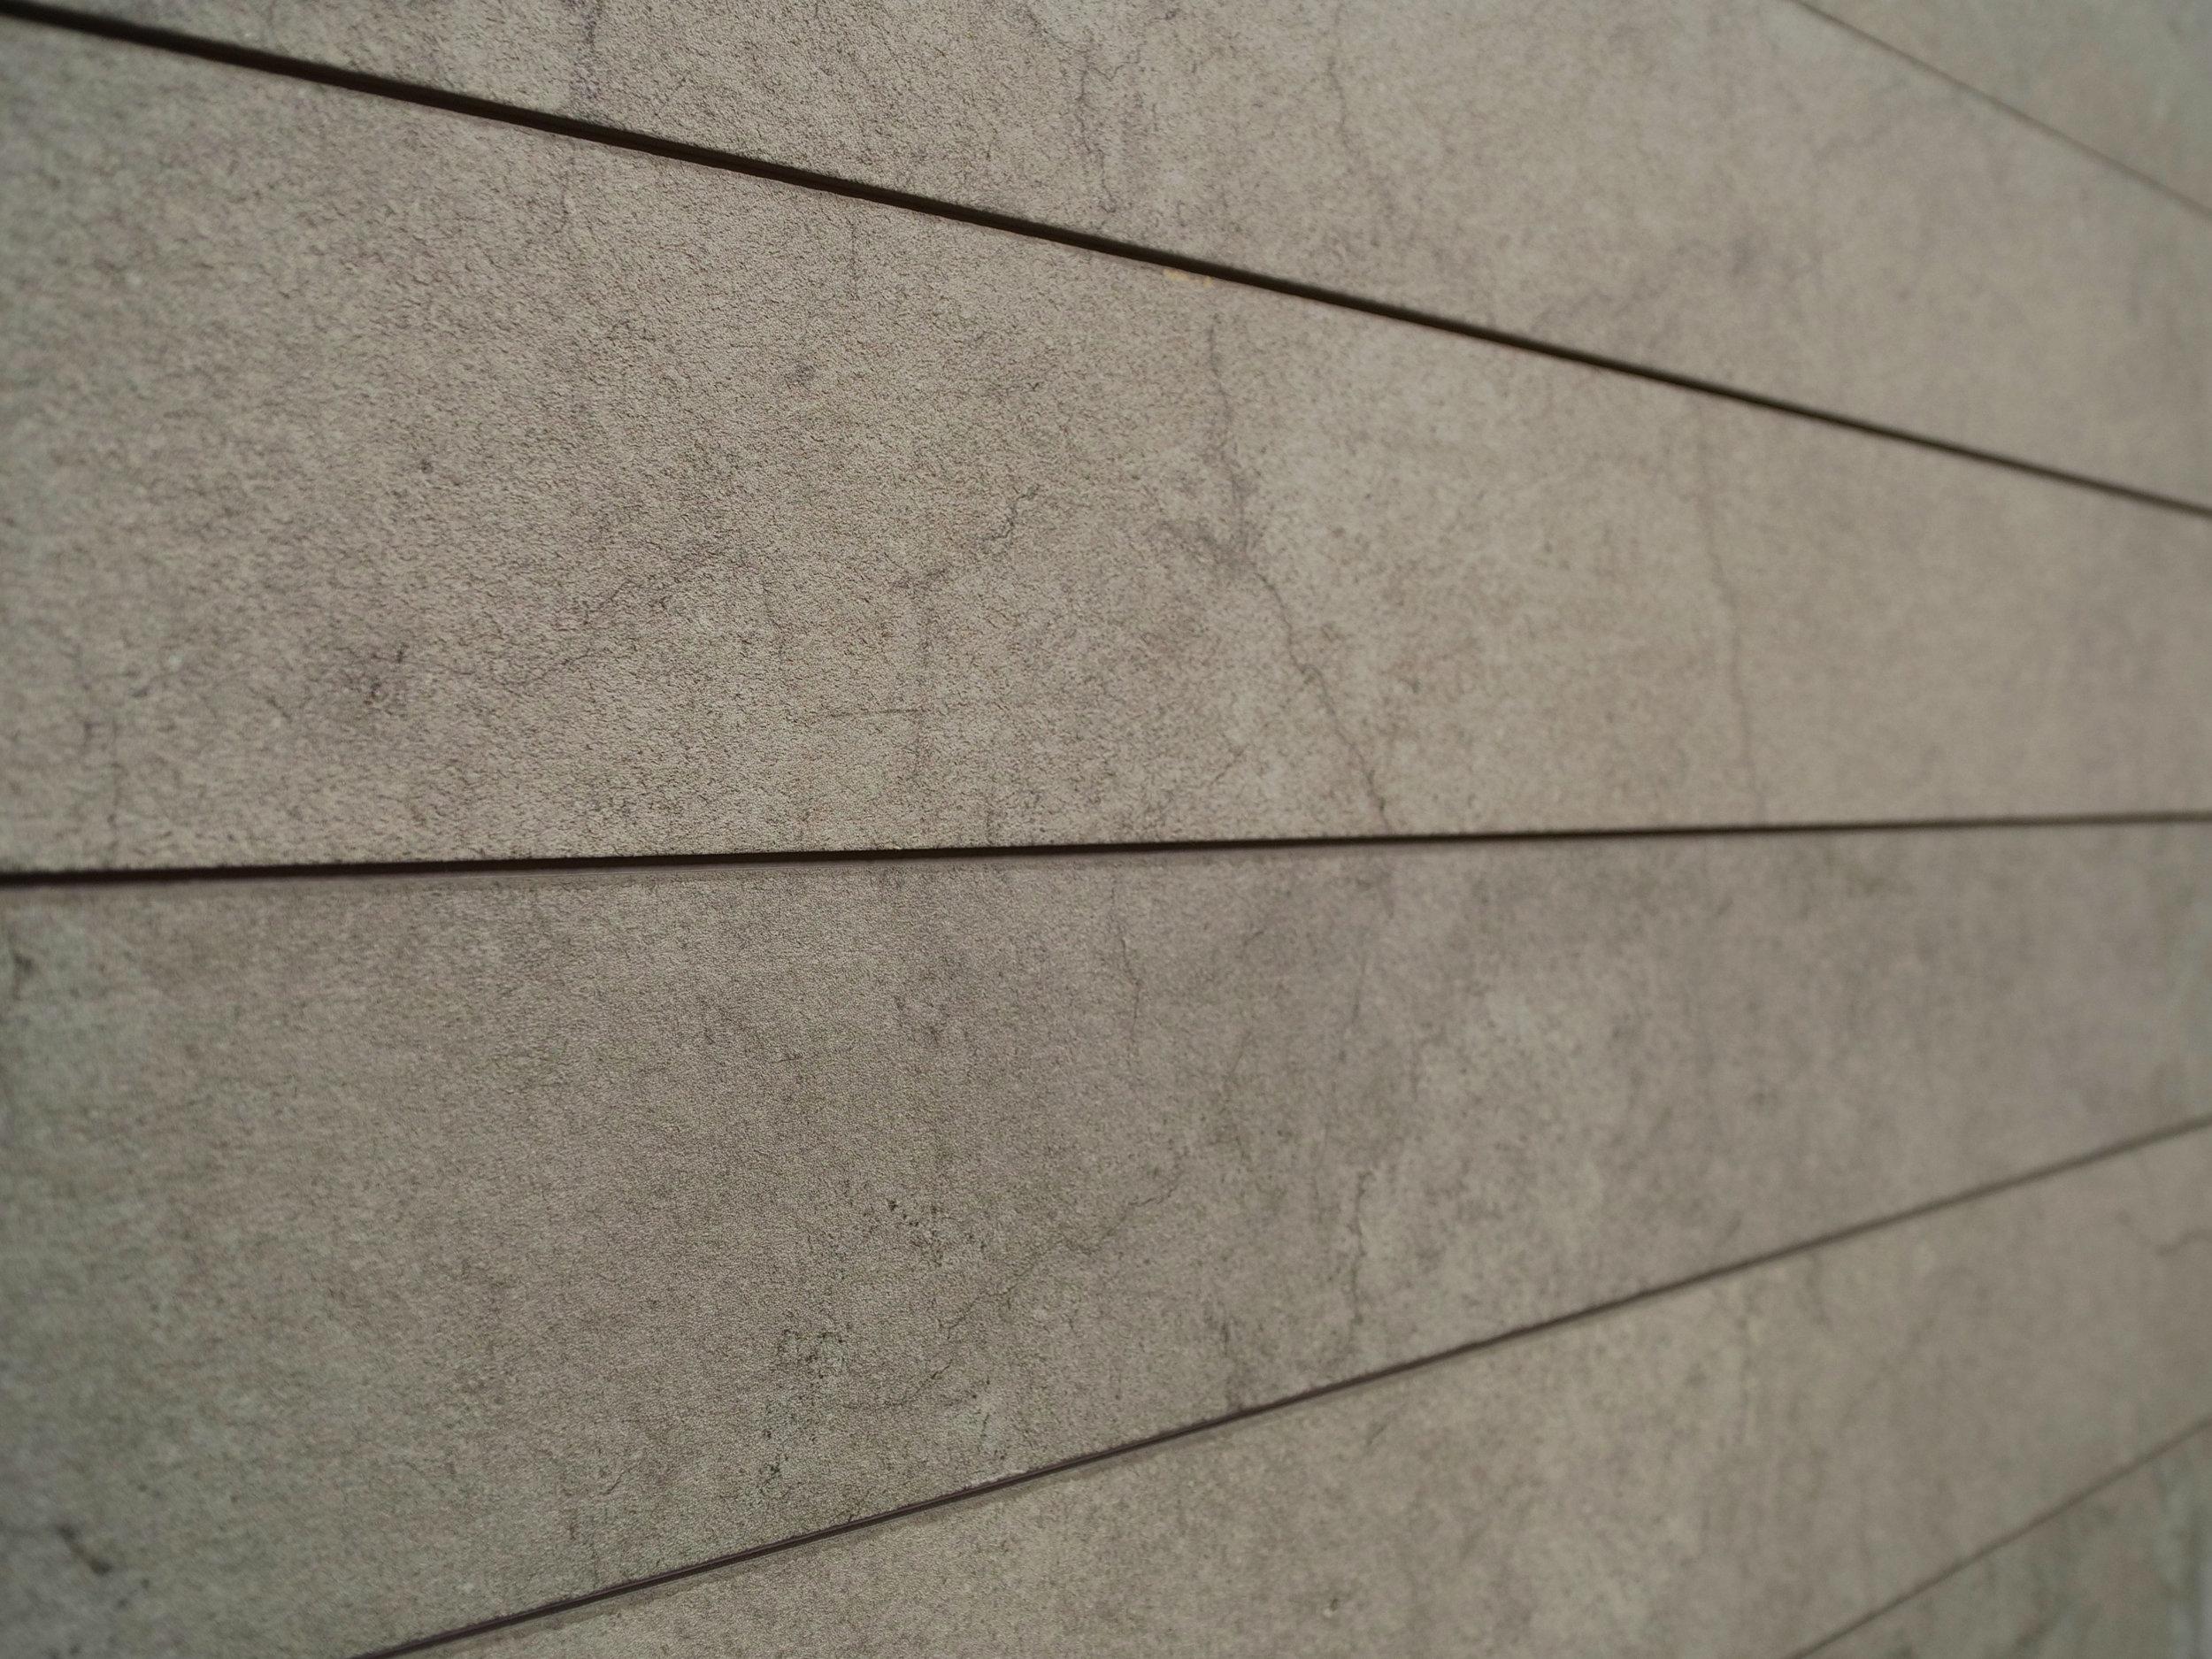 cracked concrete angle.jpg